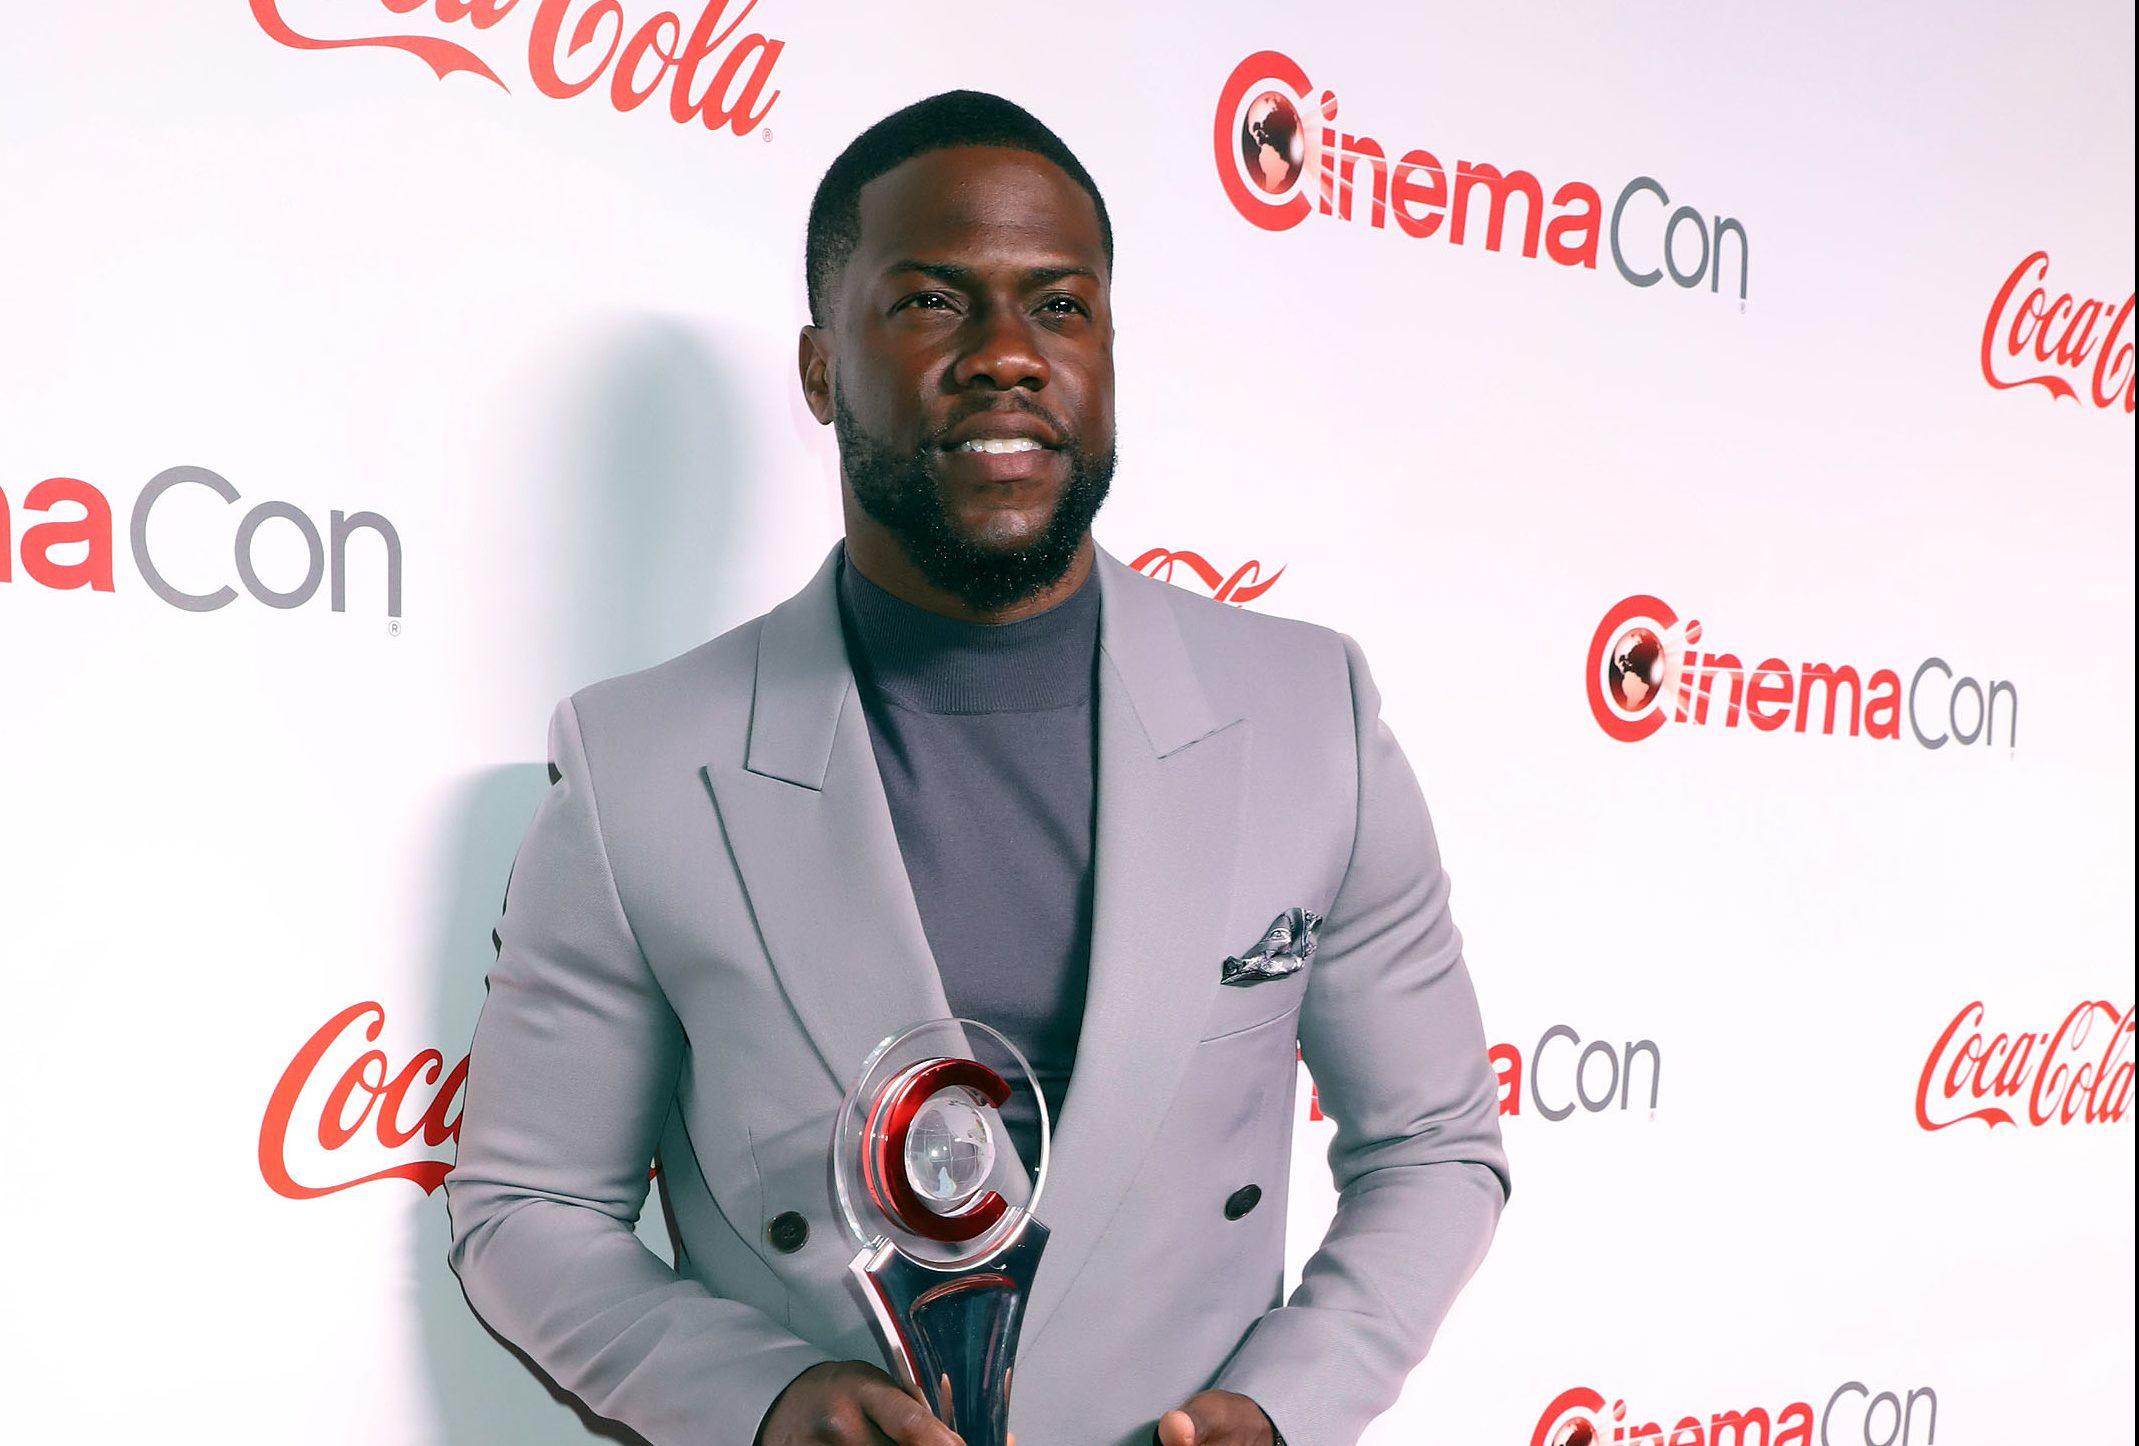 CinemaCon 2019 Big Screen Achievement Awards